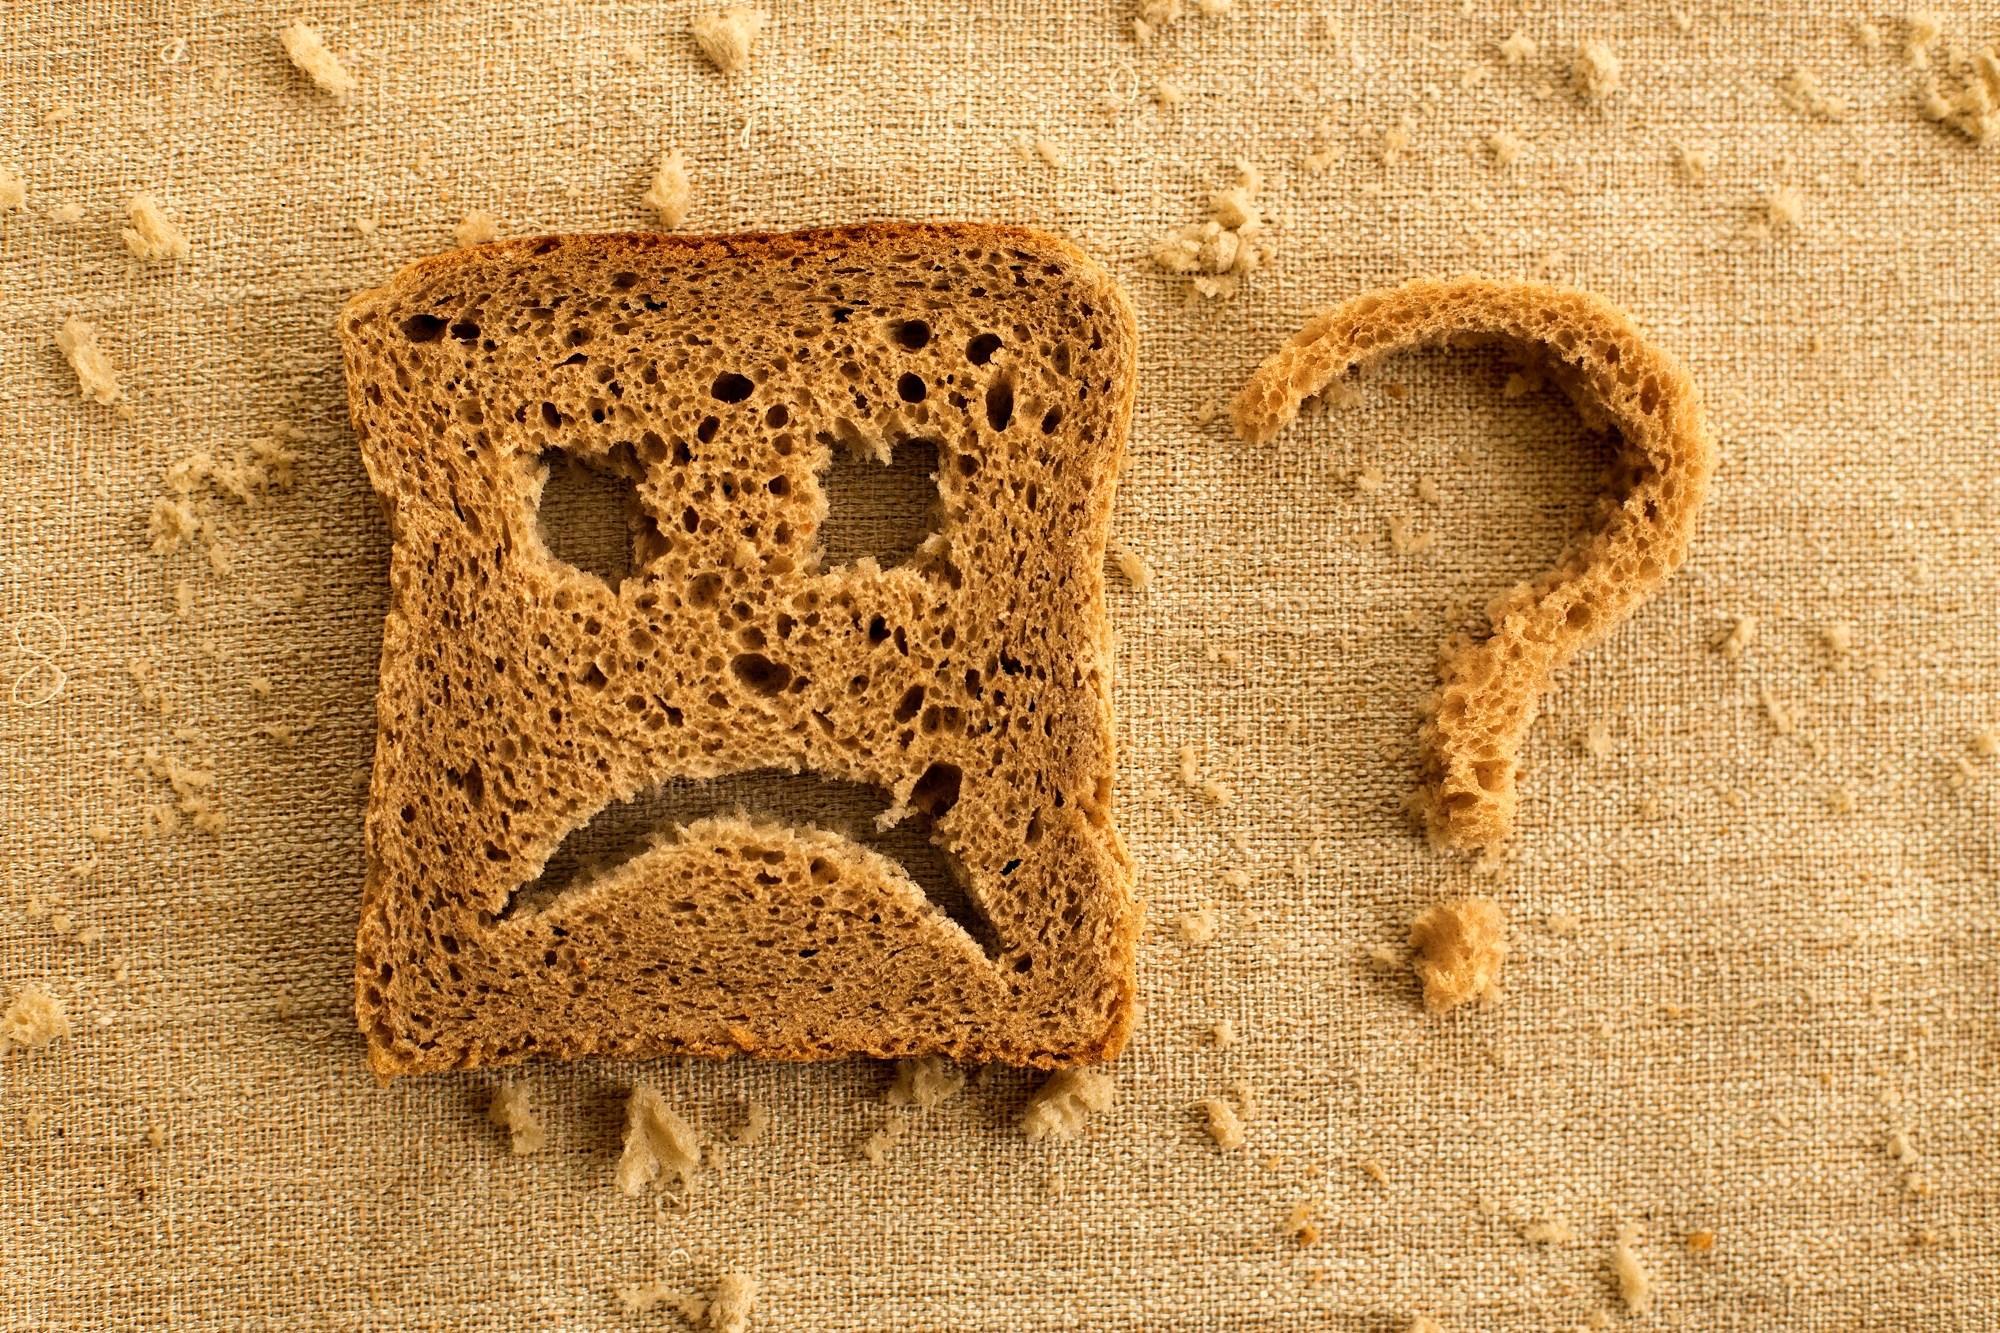 Interrelationship Between Celiac Disease, Self-Reported Wheat Sensitivity, and Functional GI Disorders